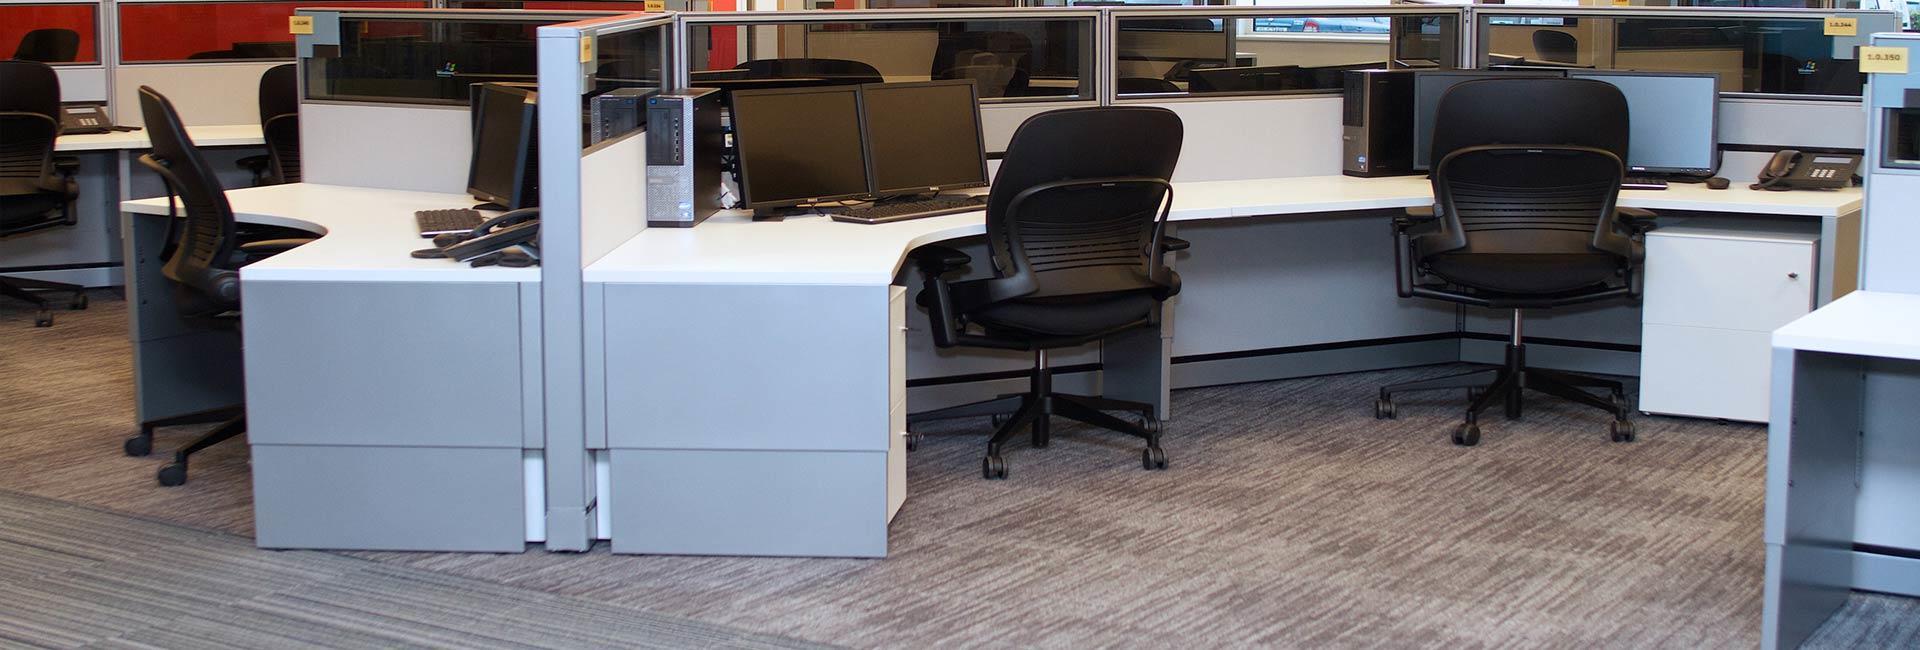 Modular Furniture Service image 7